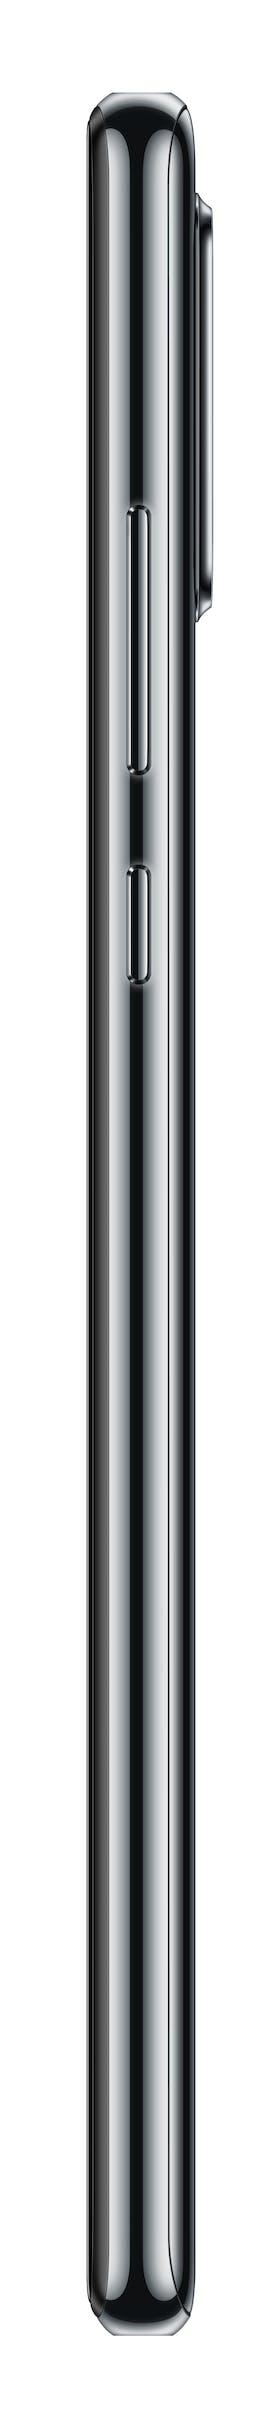 Huawei P30 Lite Black. (Bild: Huawei)